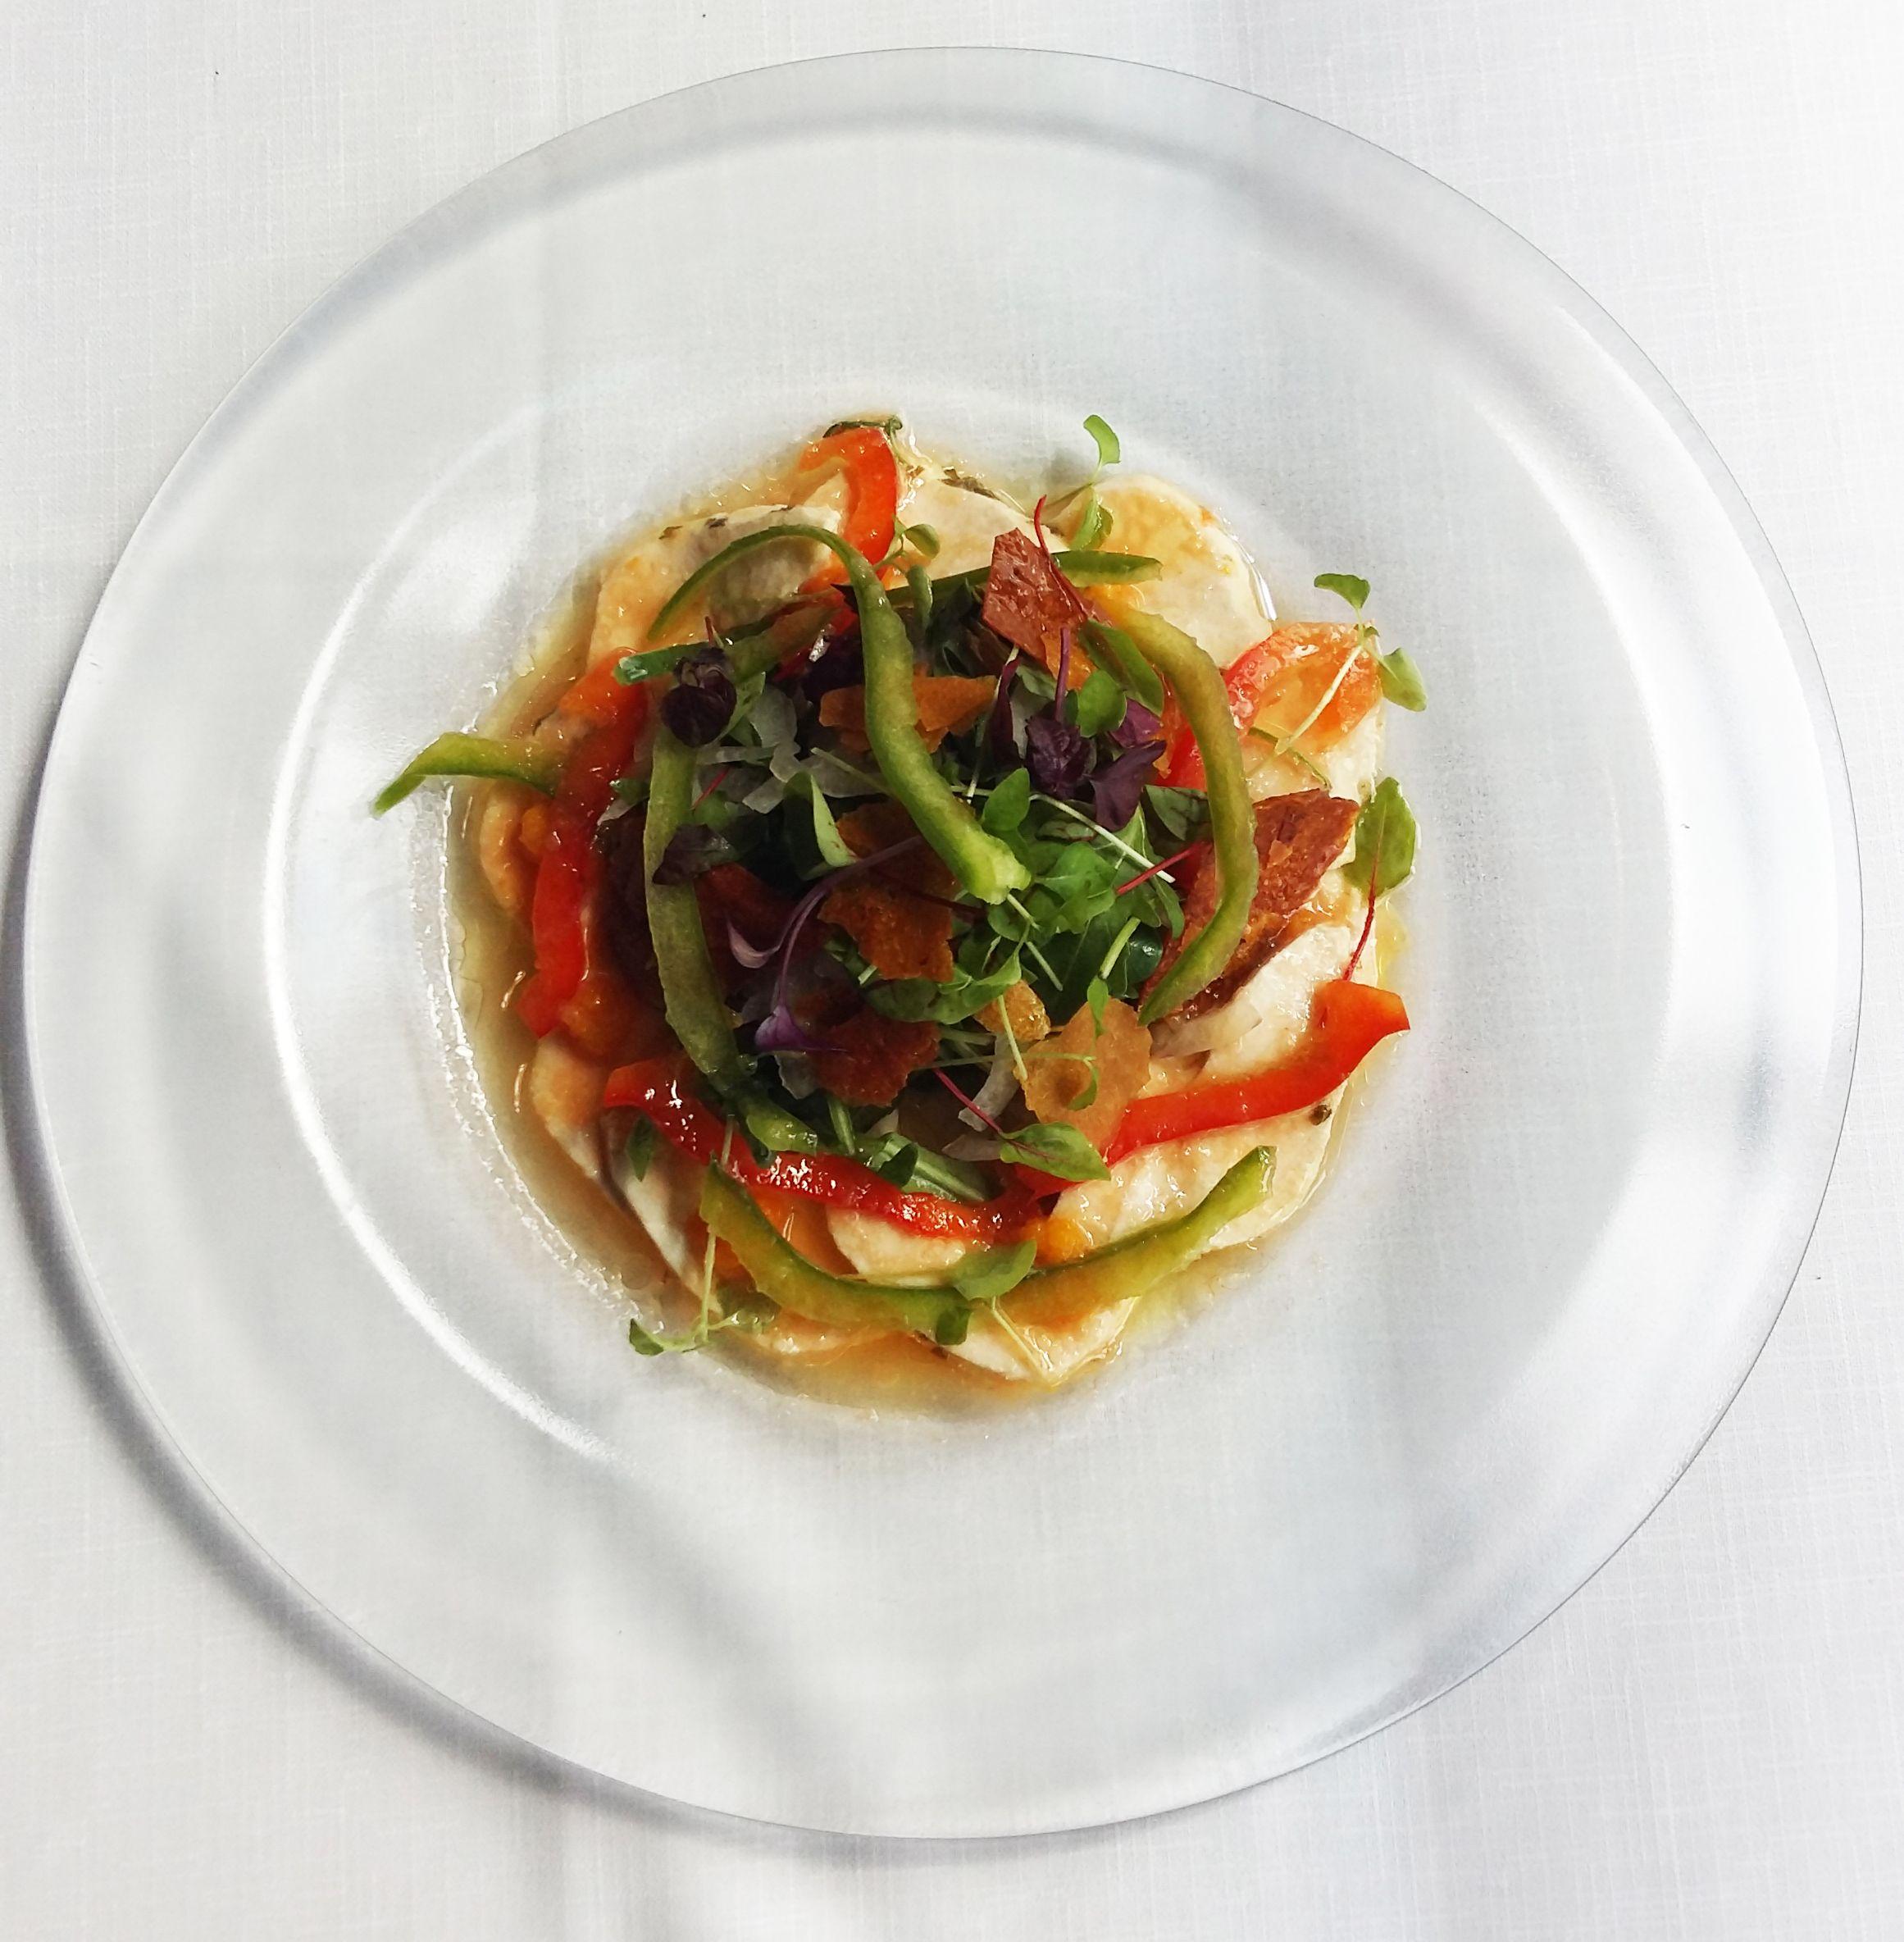 Best Seafood Restaurant London